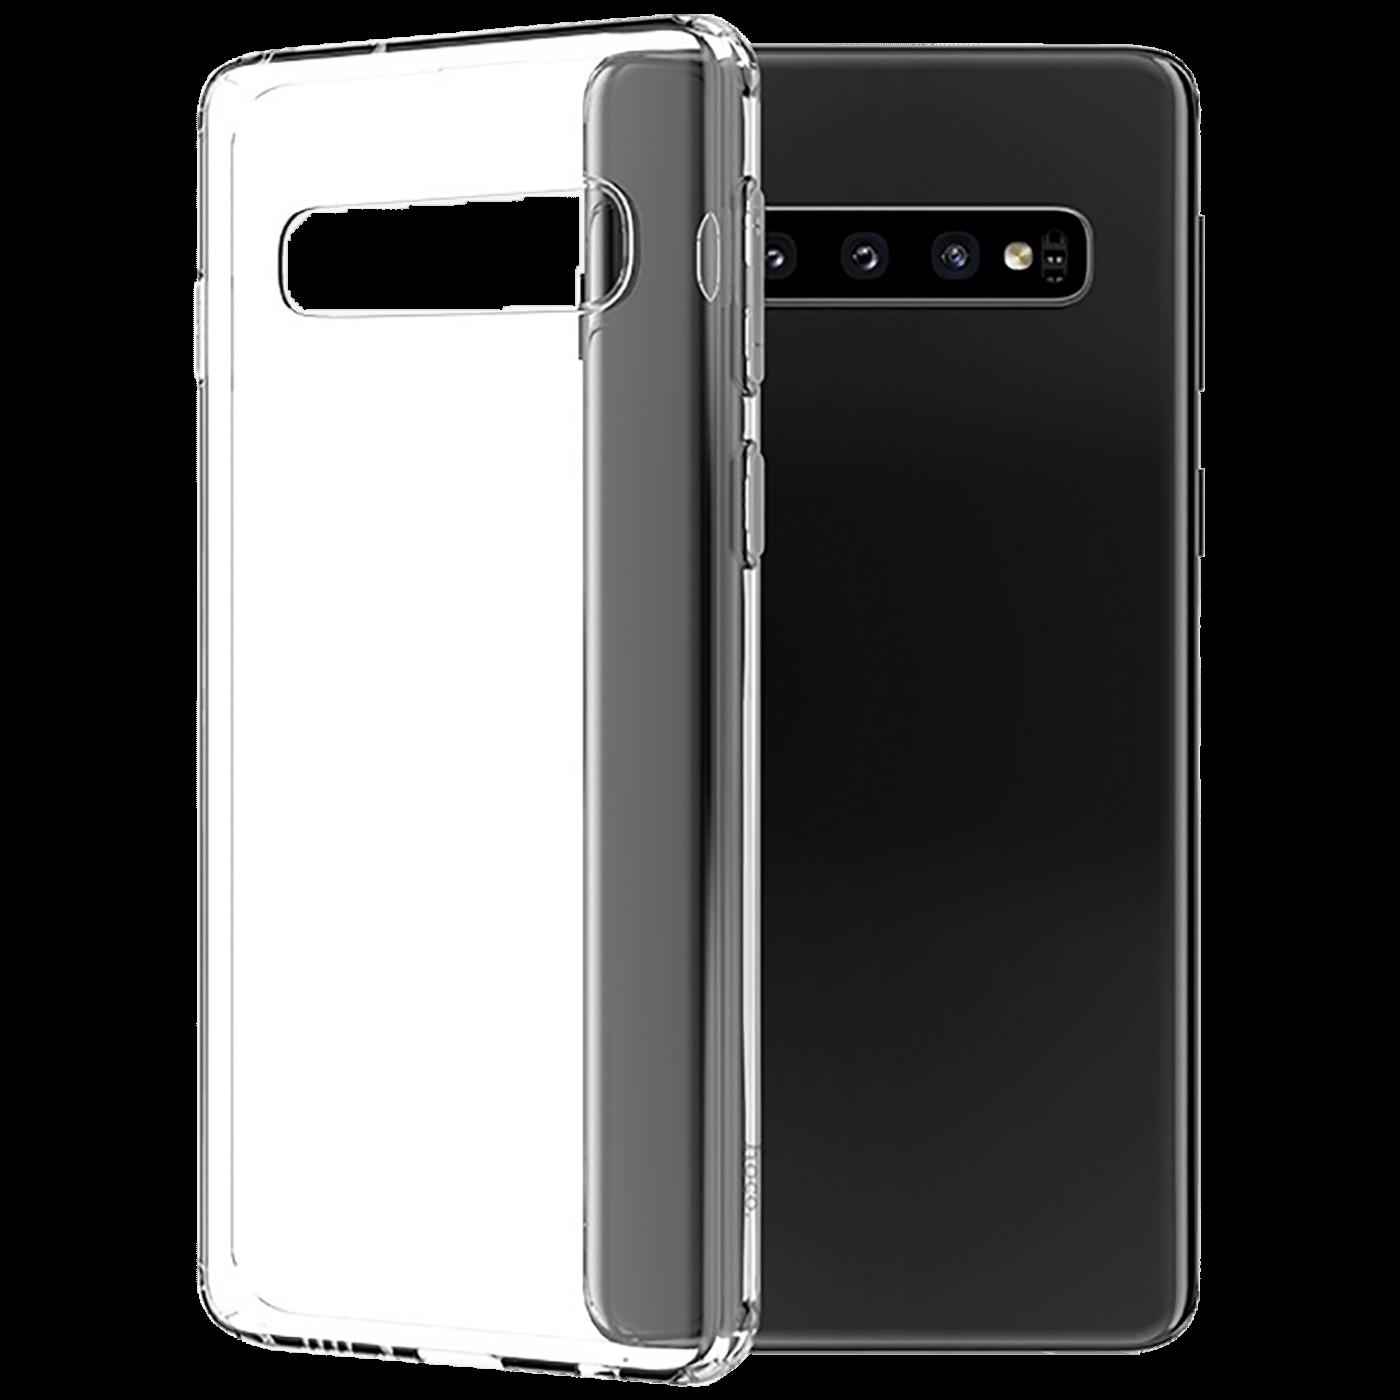 Navlaka za mobitel Samsung Galaxy S10e, transparent